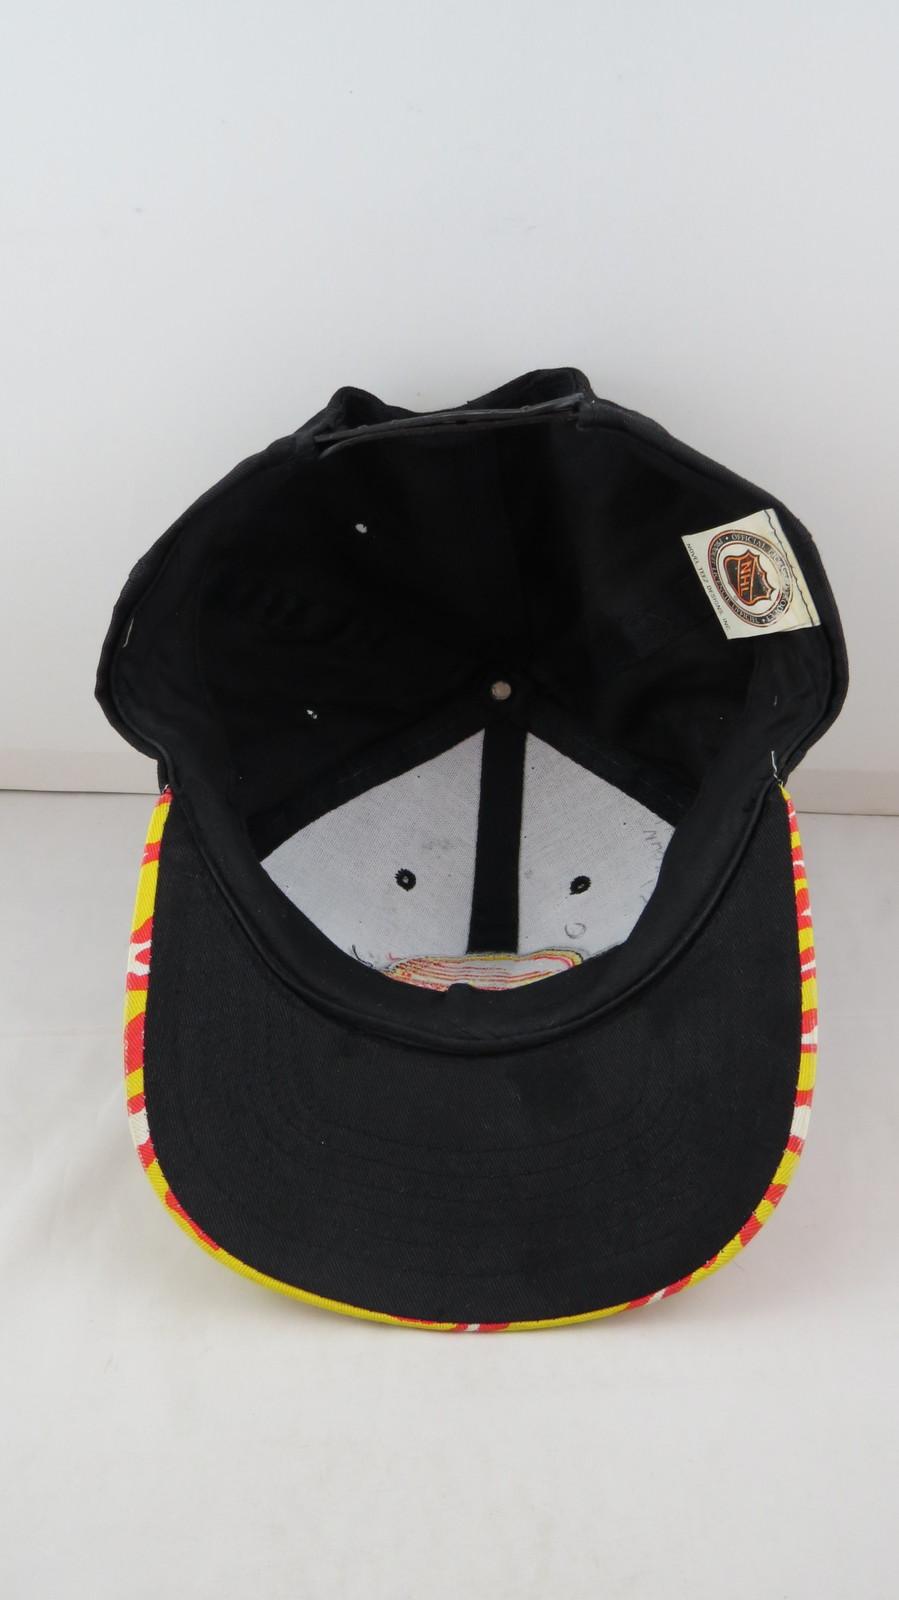 Vancouver Canucks Hat (VTG) - Zubaz Brim  Black Body - Adult Snapback